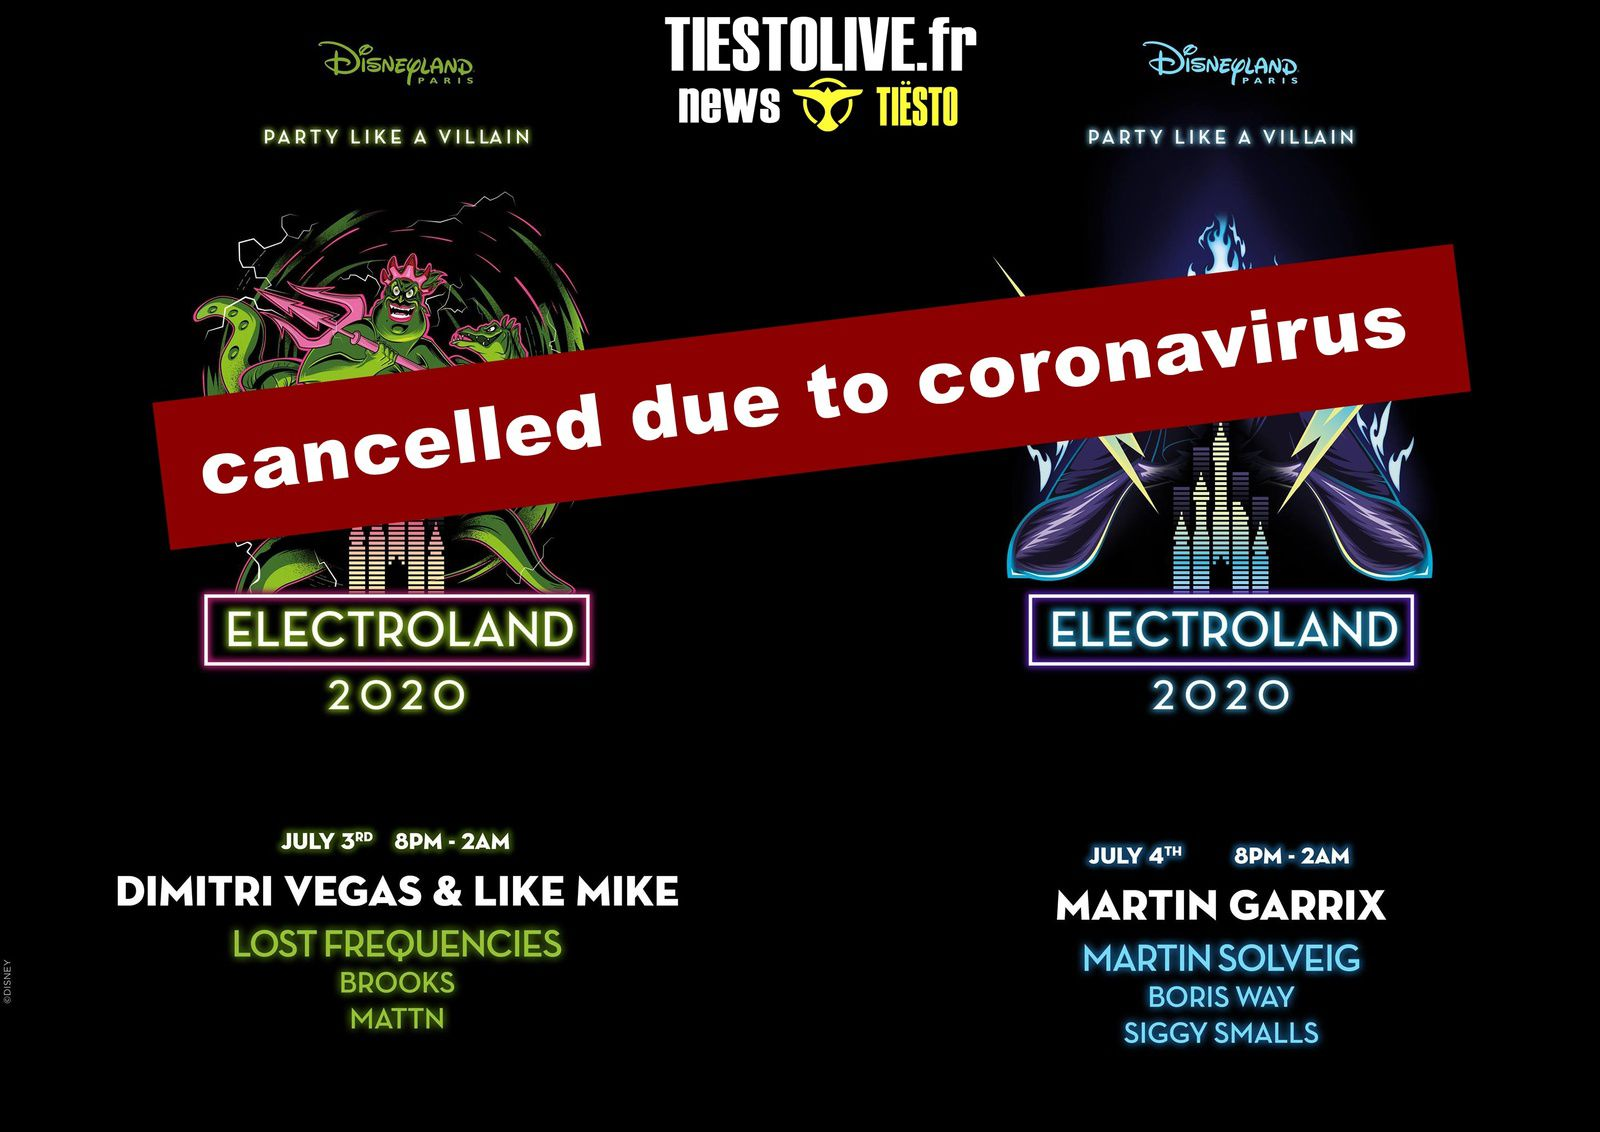 ⚠ Electroland Festival 2020, Disneyland Paris, France, cancelled due to coronavirus ⚠